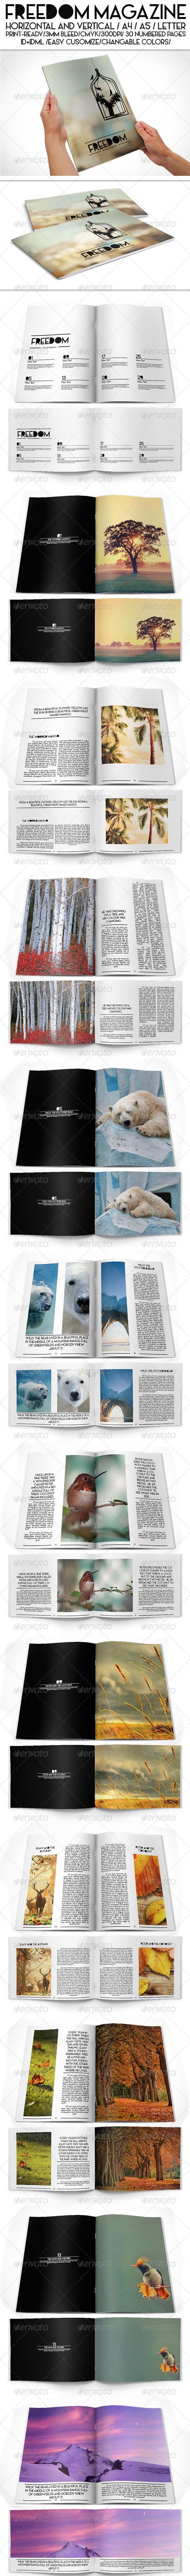 Freedom Magazine Pack - Magazines Print Templates